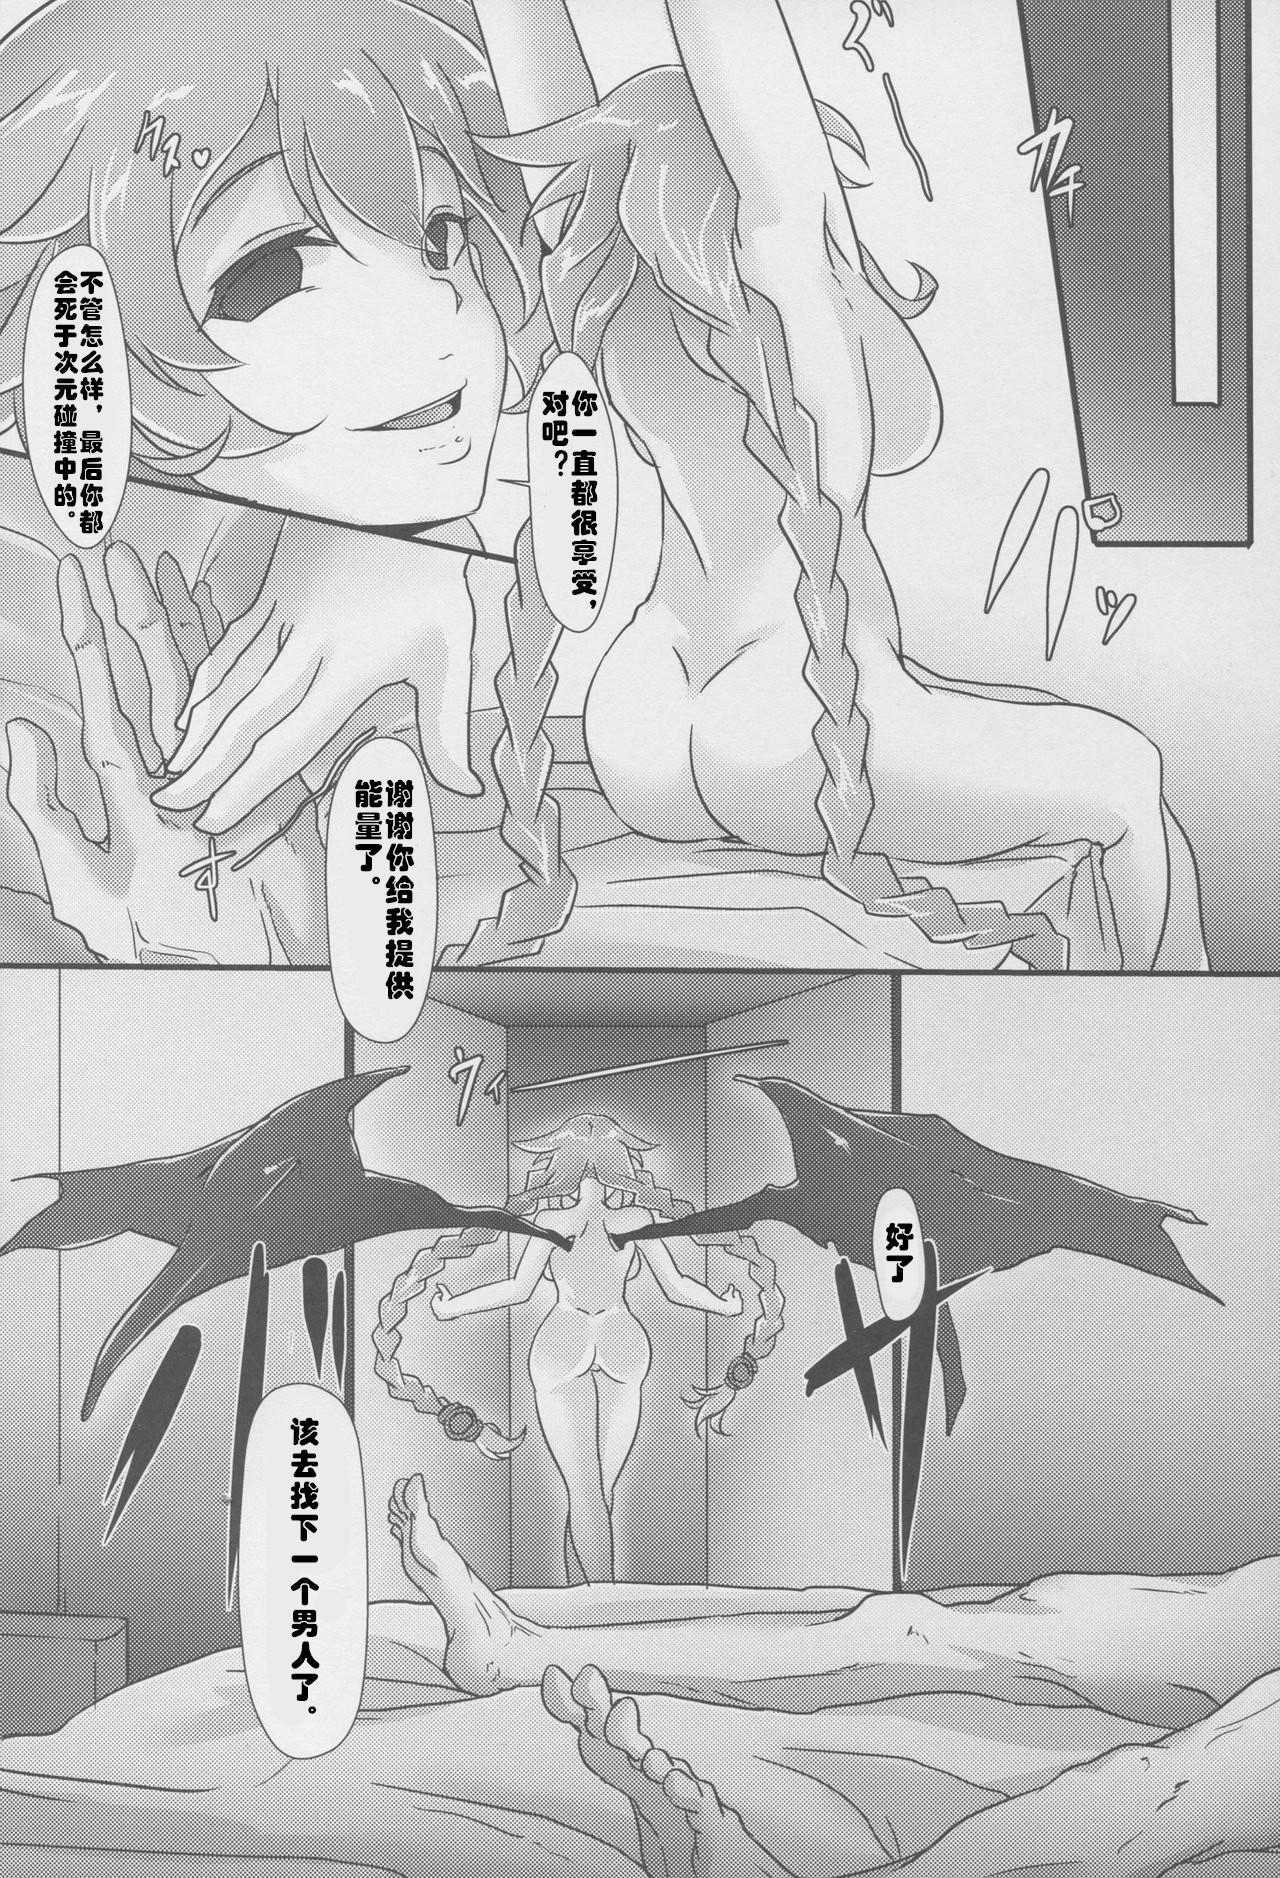 Nightmare from Goddess 27